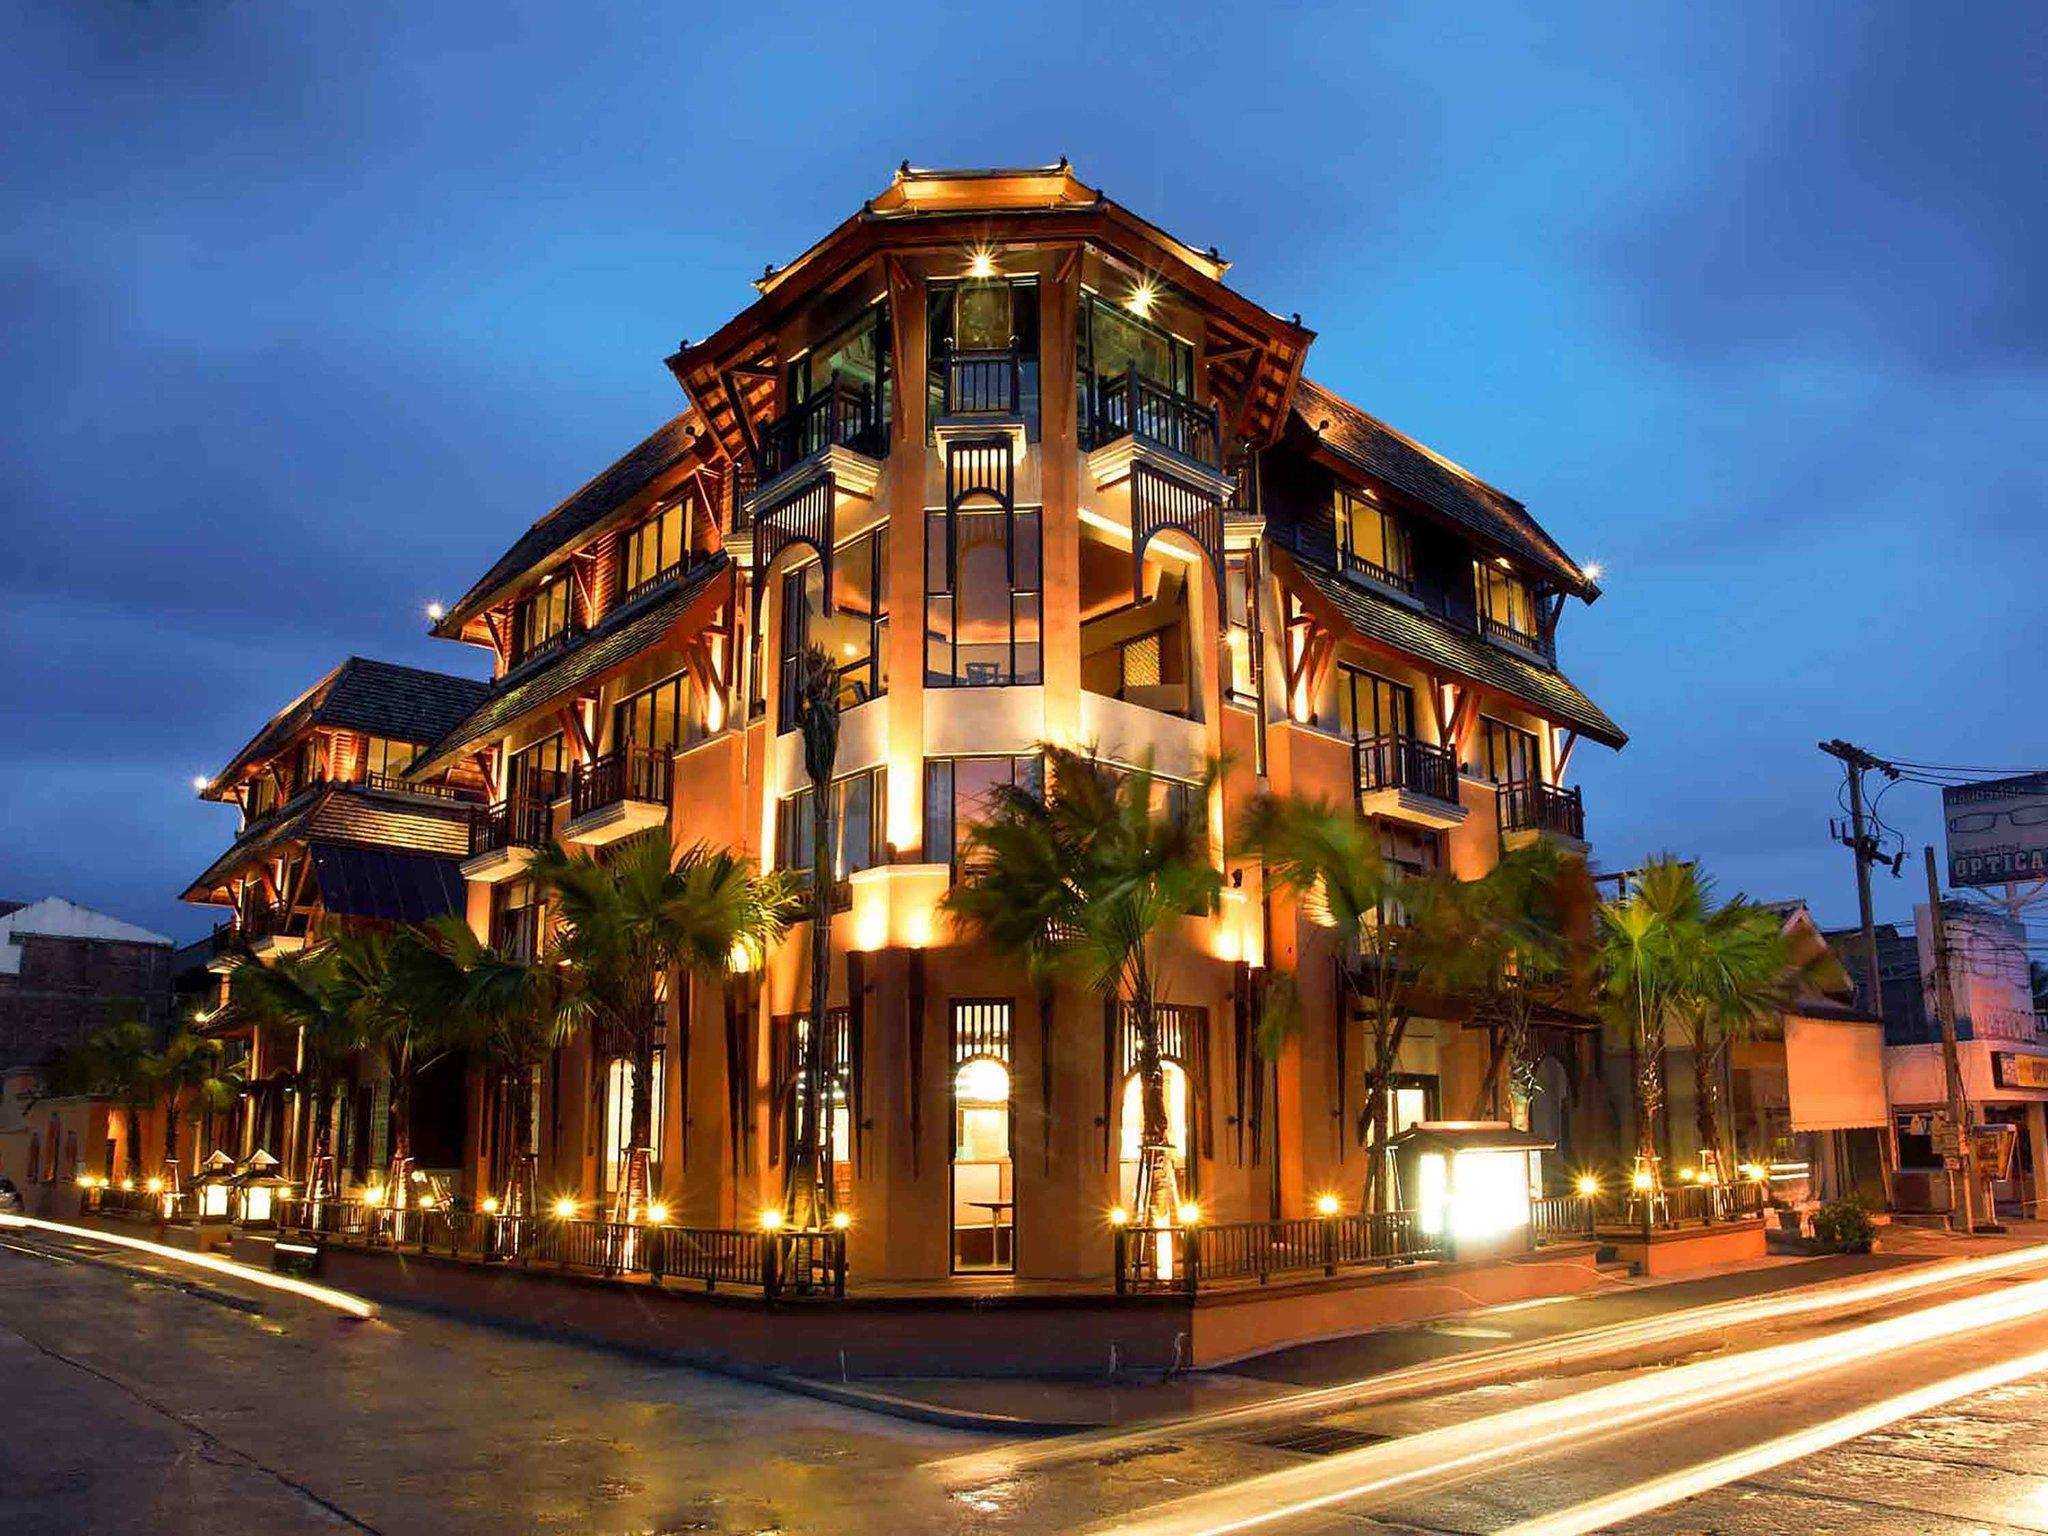 Mercure Samui Chaweng Tana Hotel - Koh Samui